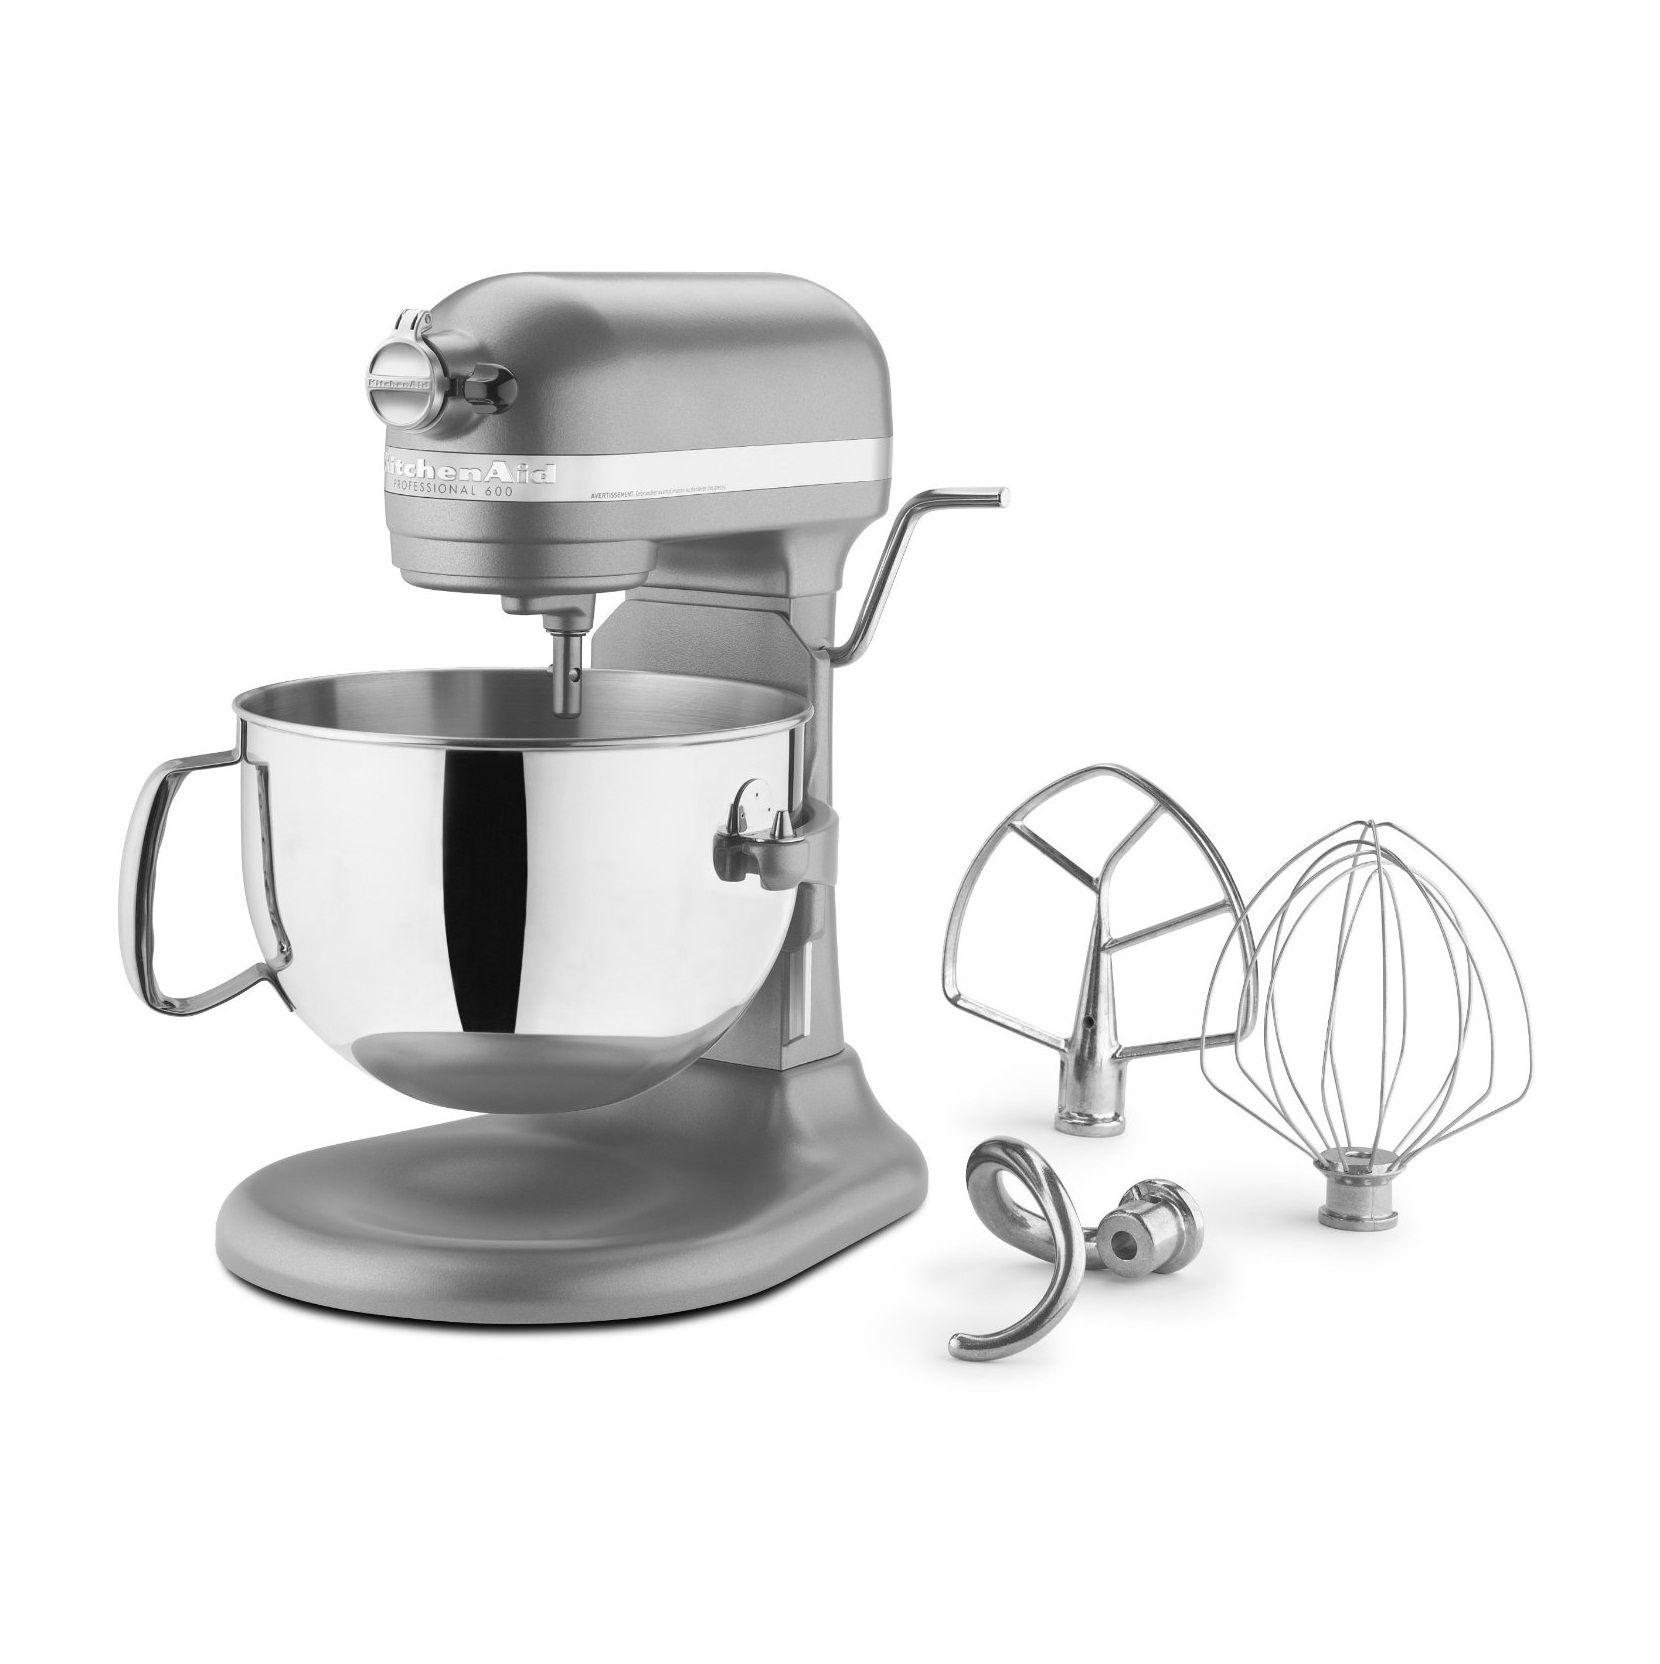 Kitchenaid 600 series professional stand mixer mixers on